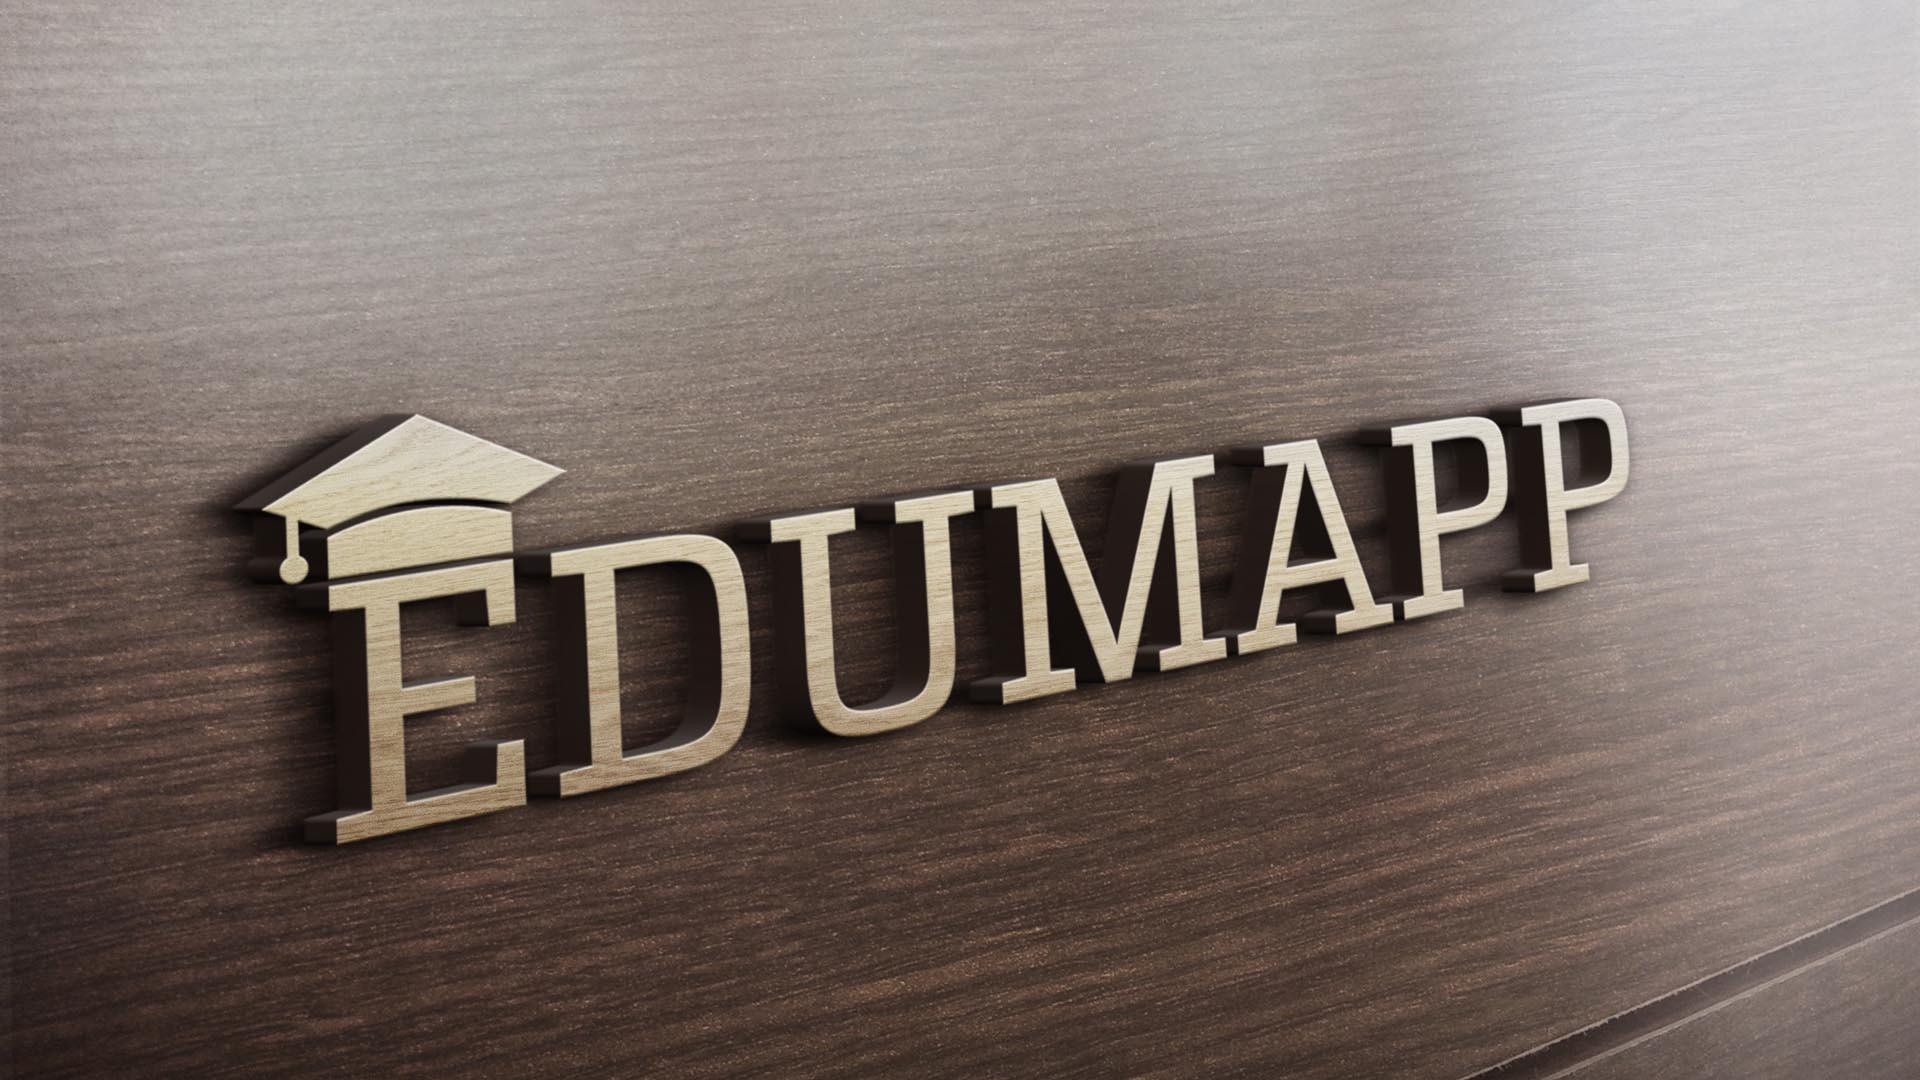 Edumapp-Logo-Wood-Craft